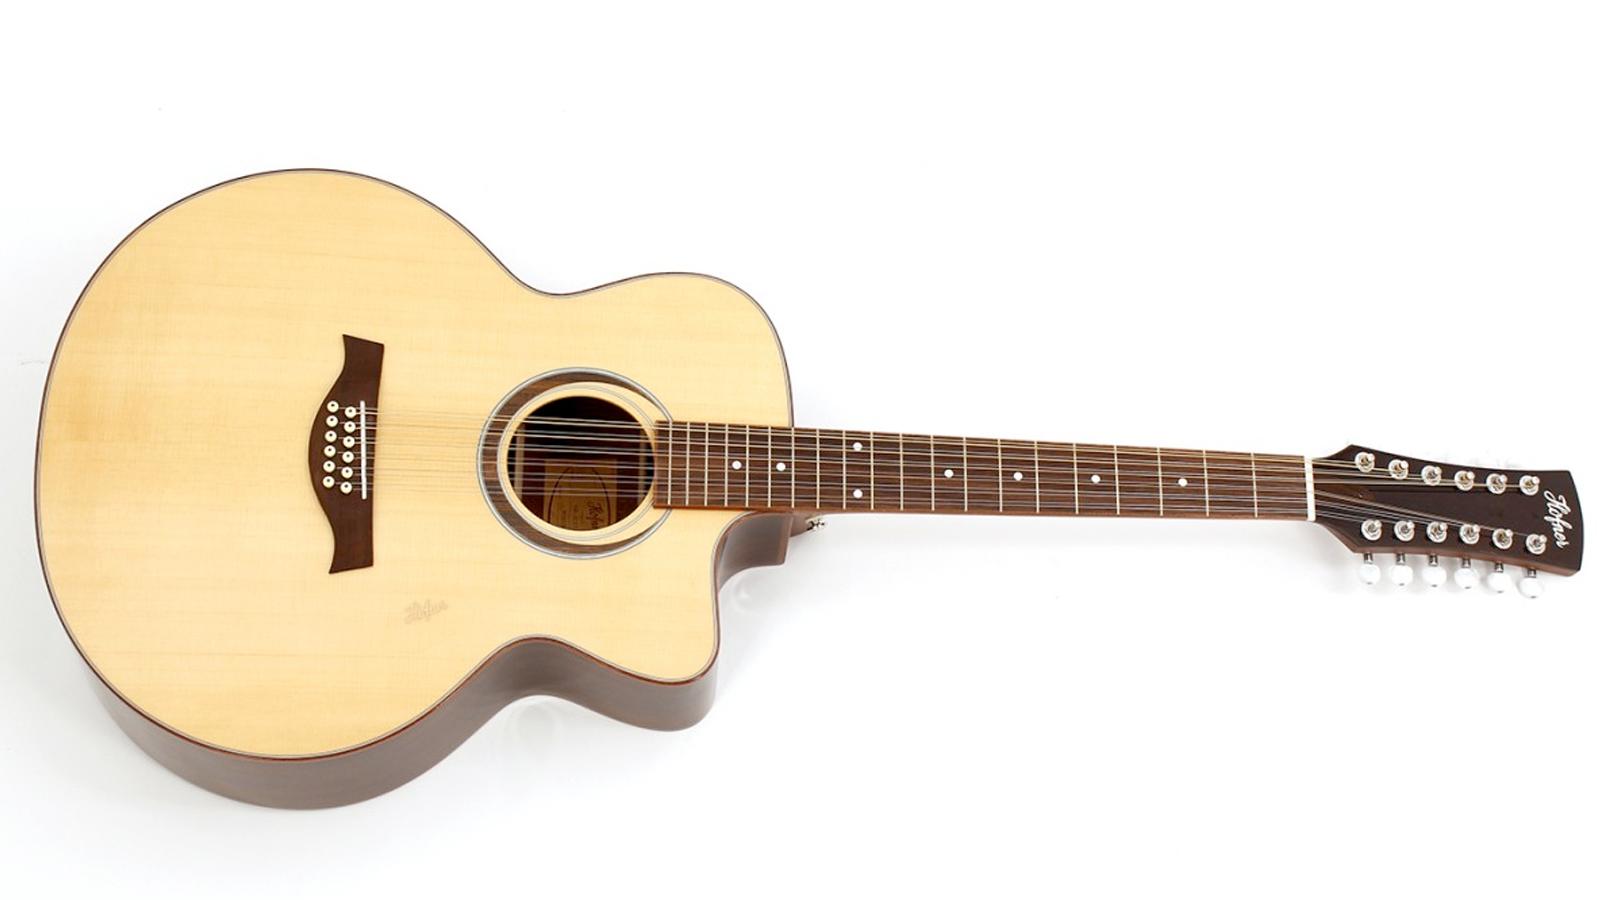 Höfner HA-JC17-N12-0 Westerngitarre 12-Saiter